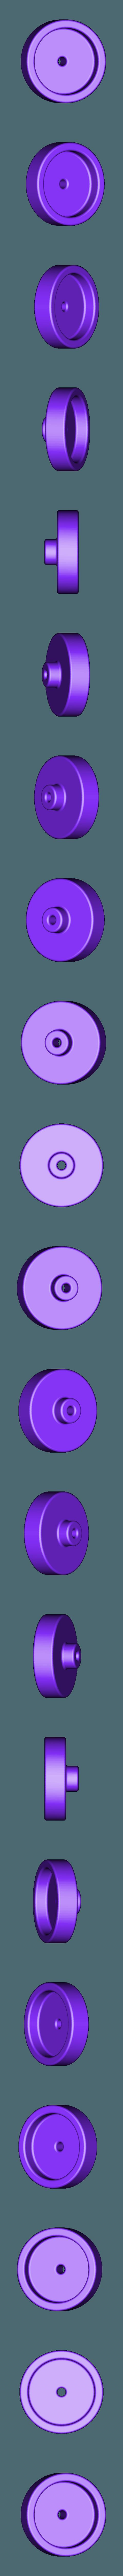 Gear_Box_Spigot.STL Download free STL file Automata-4 Ben rides around the clock • 3D printer template, woodenclocks